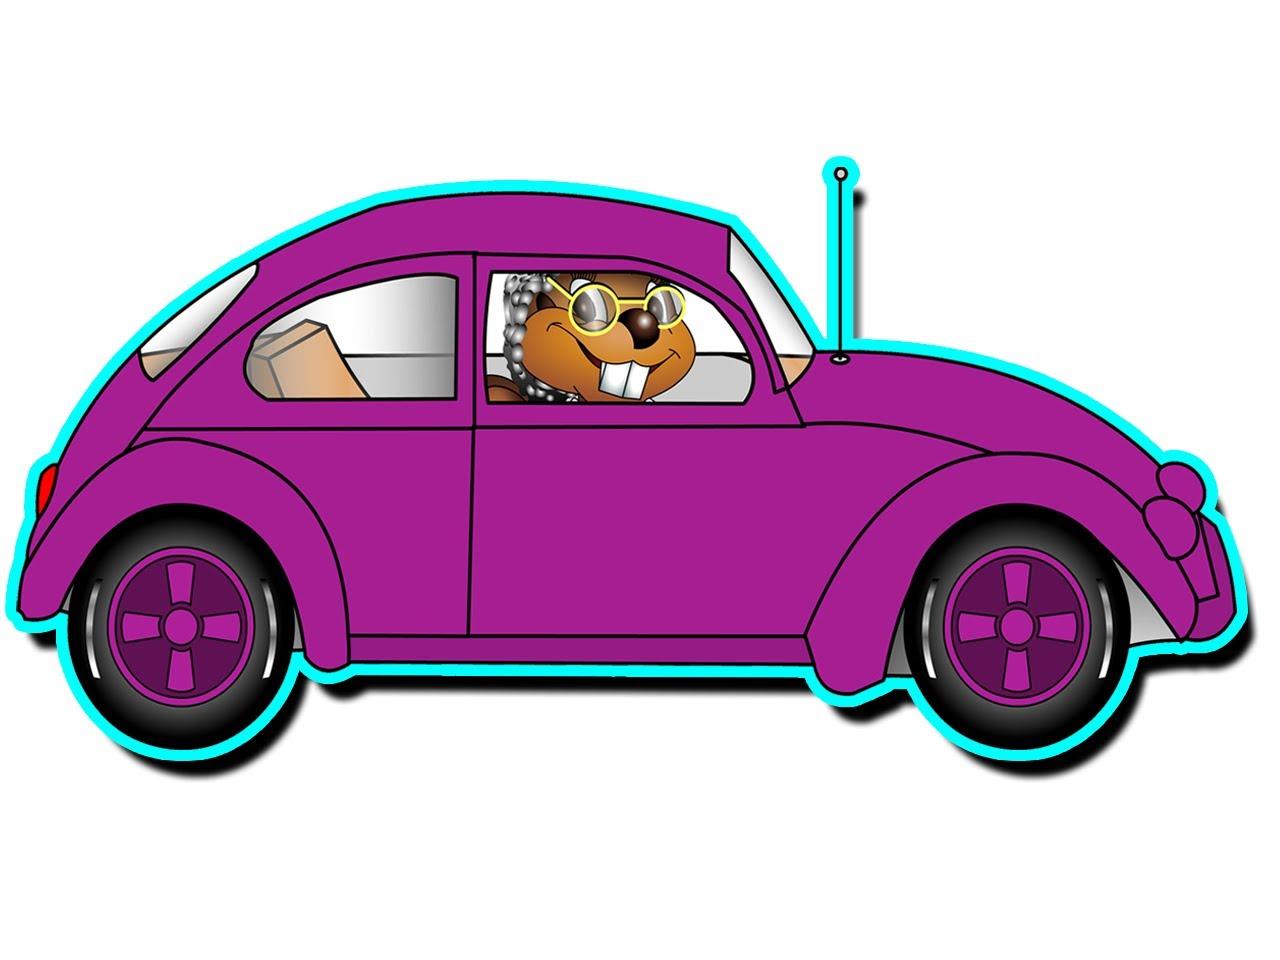 Grandma's Got a Little Purple Car